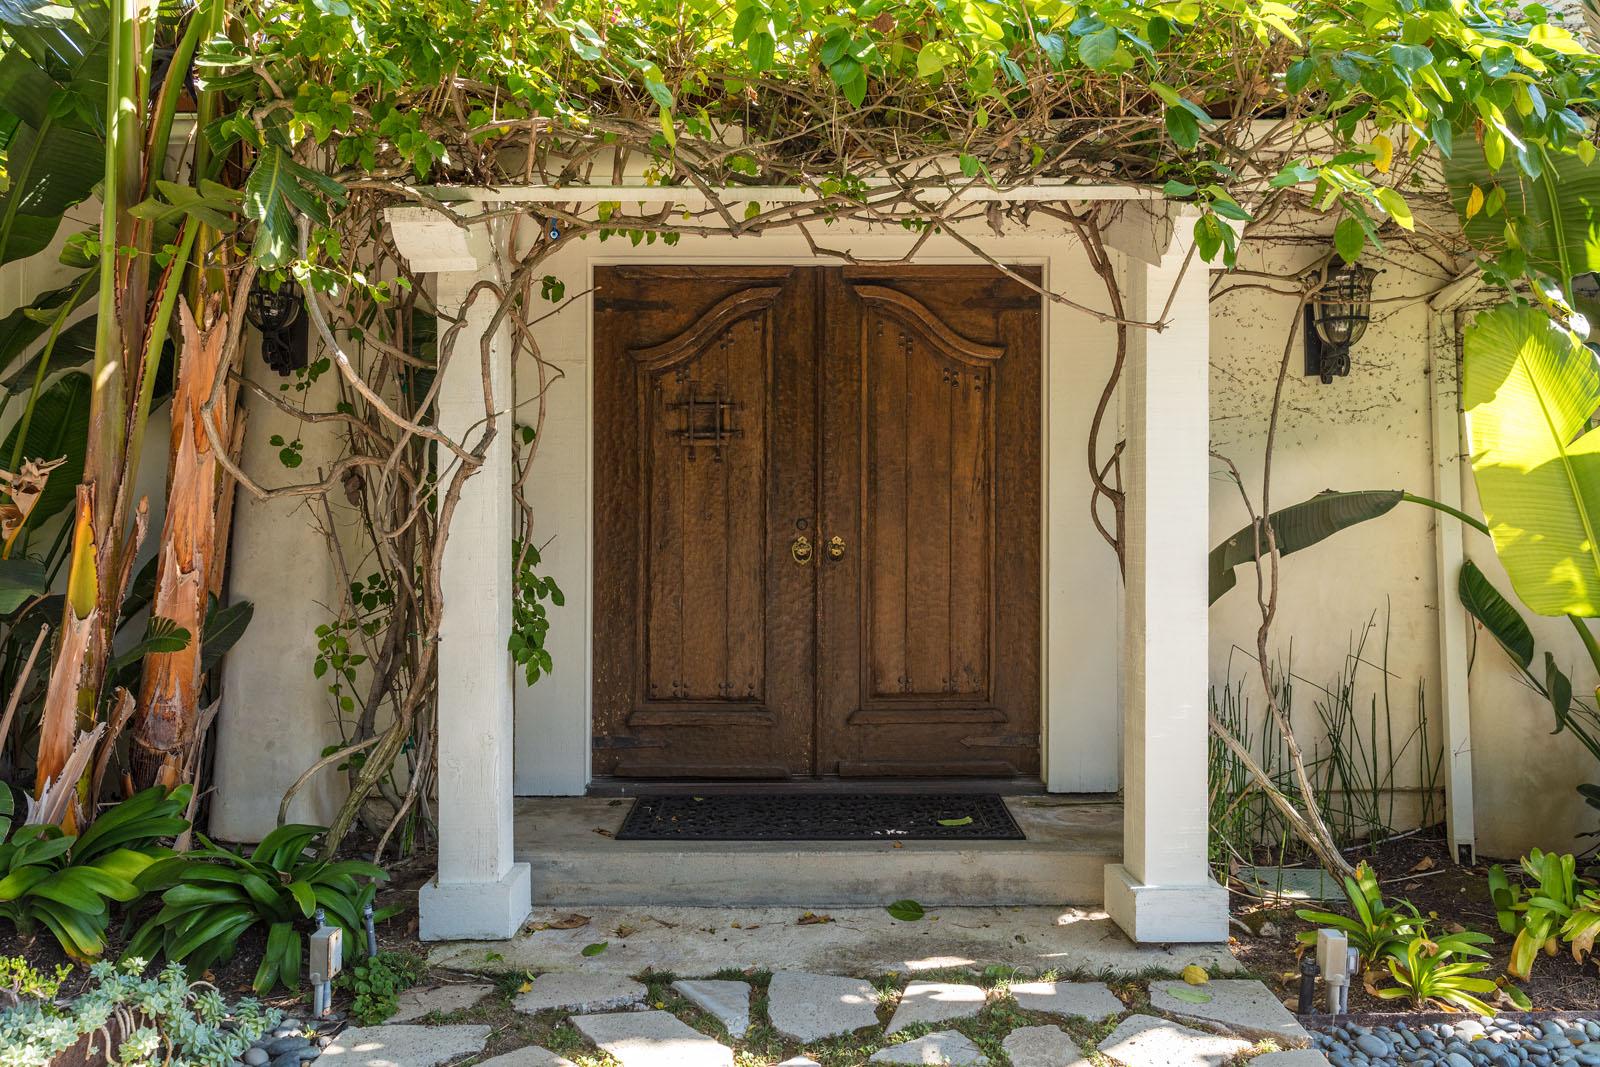 008 Front Door 1712 Manzanita Park Avenue Malibu For Sale Lease The Malibu Life Team Luxury Real Estate.jpg